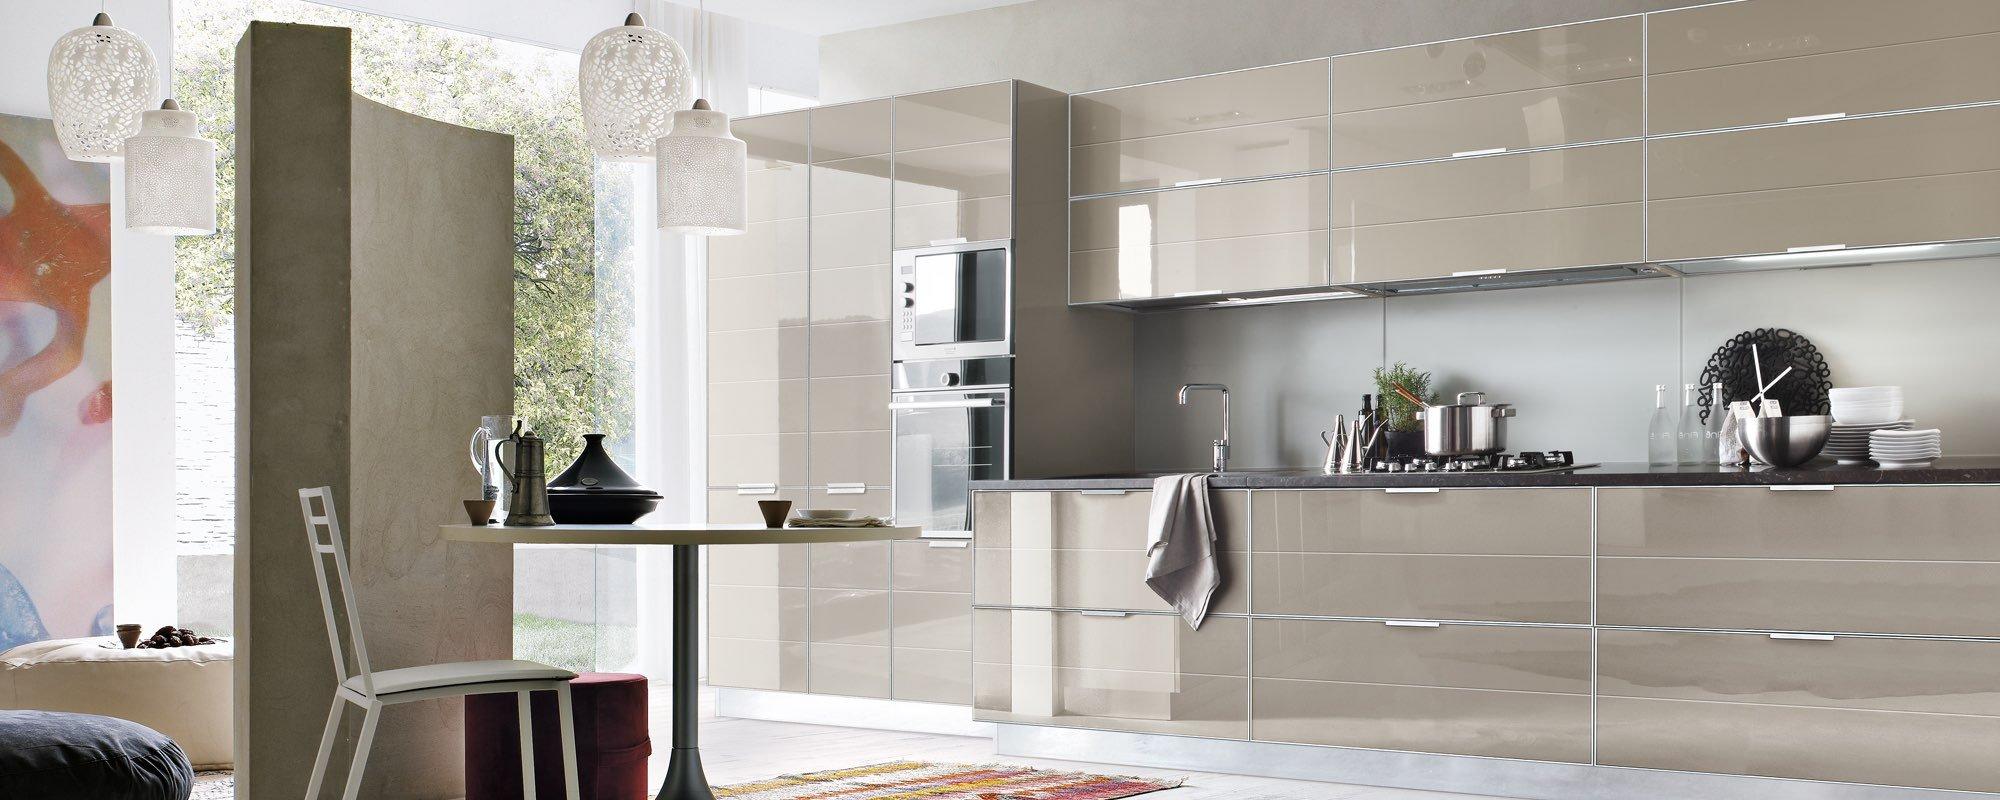 cucina moderna con arredamento -Brilliant